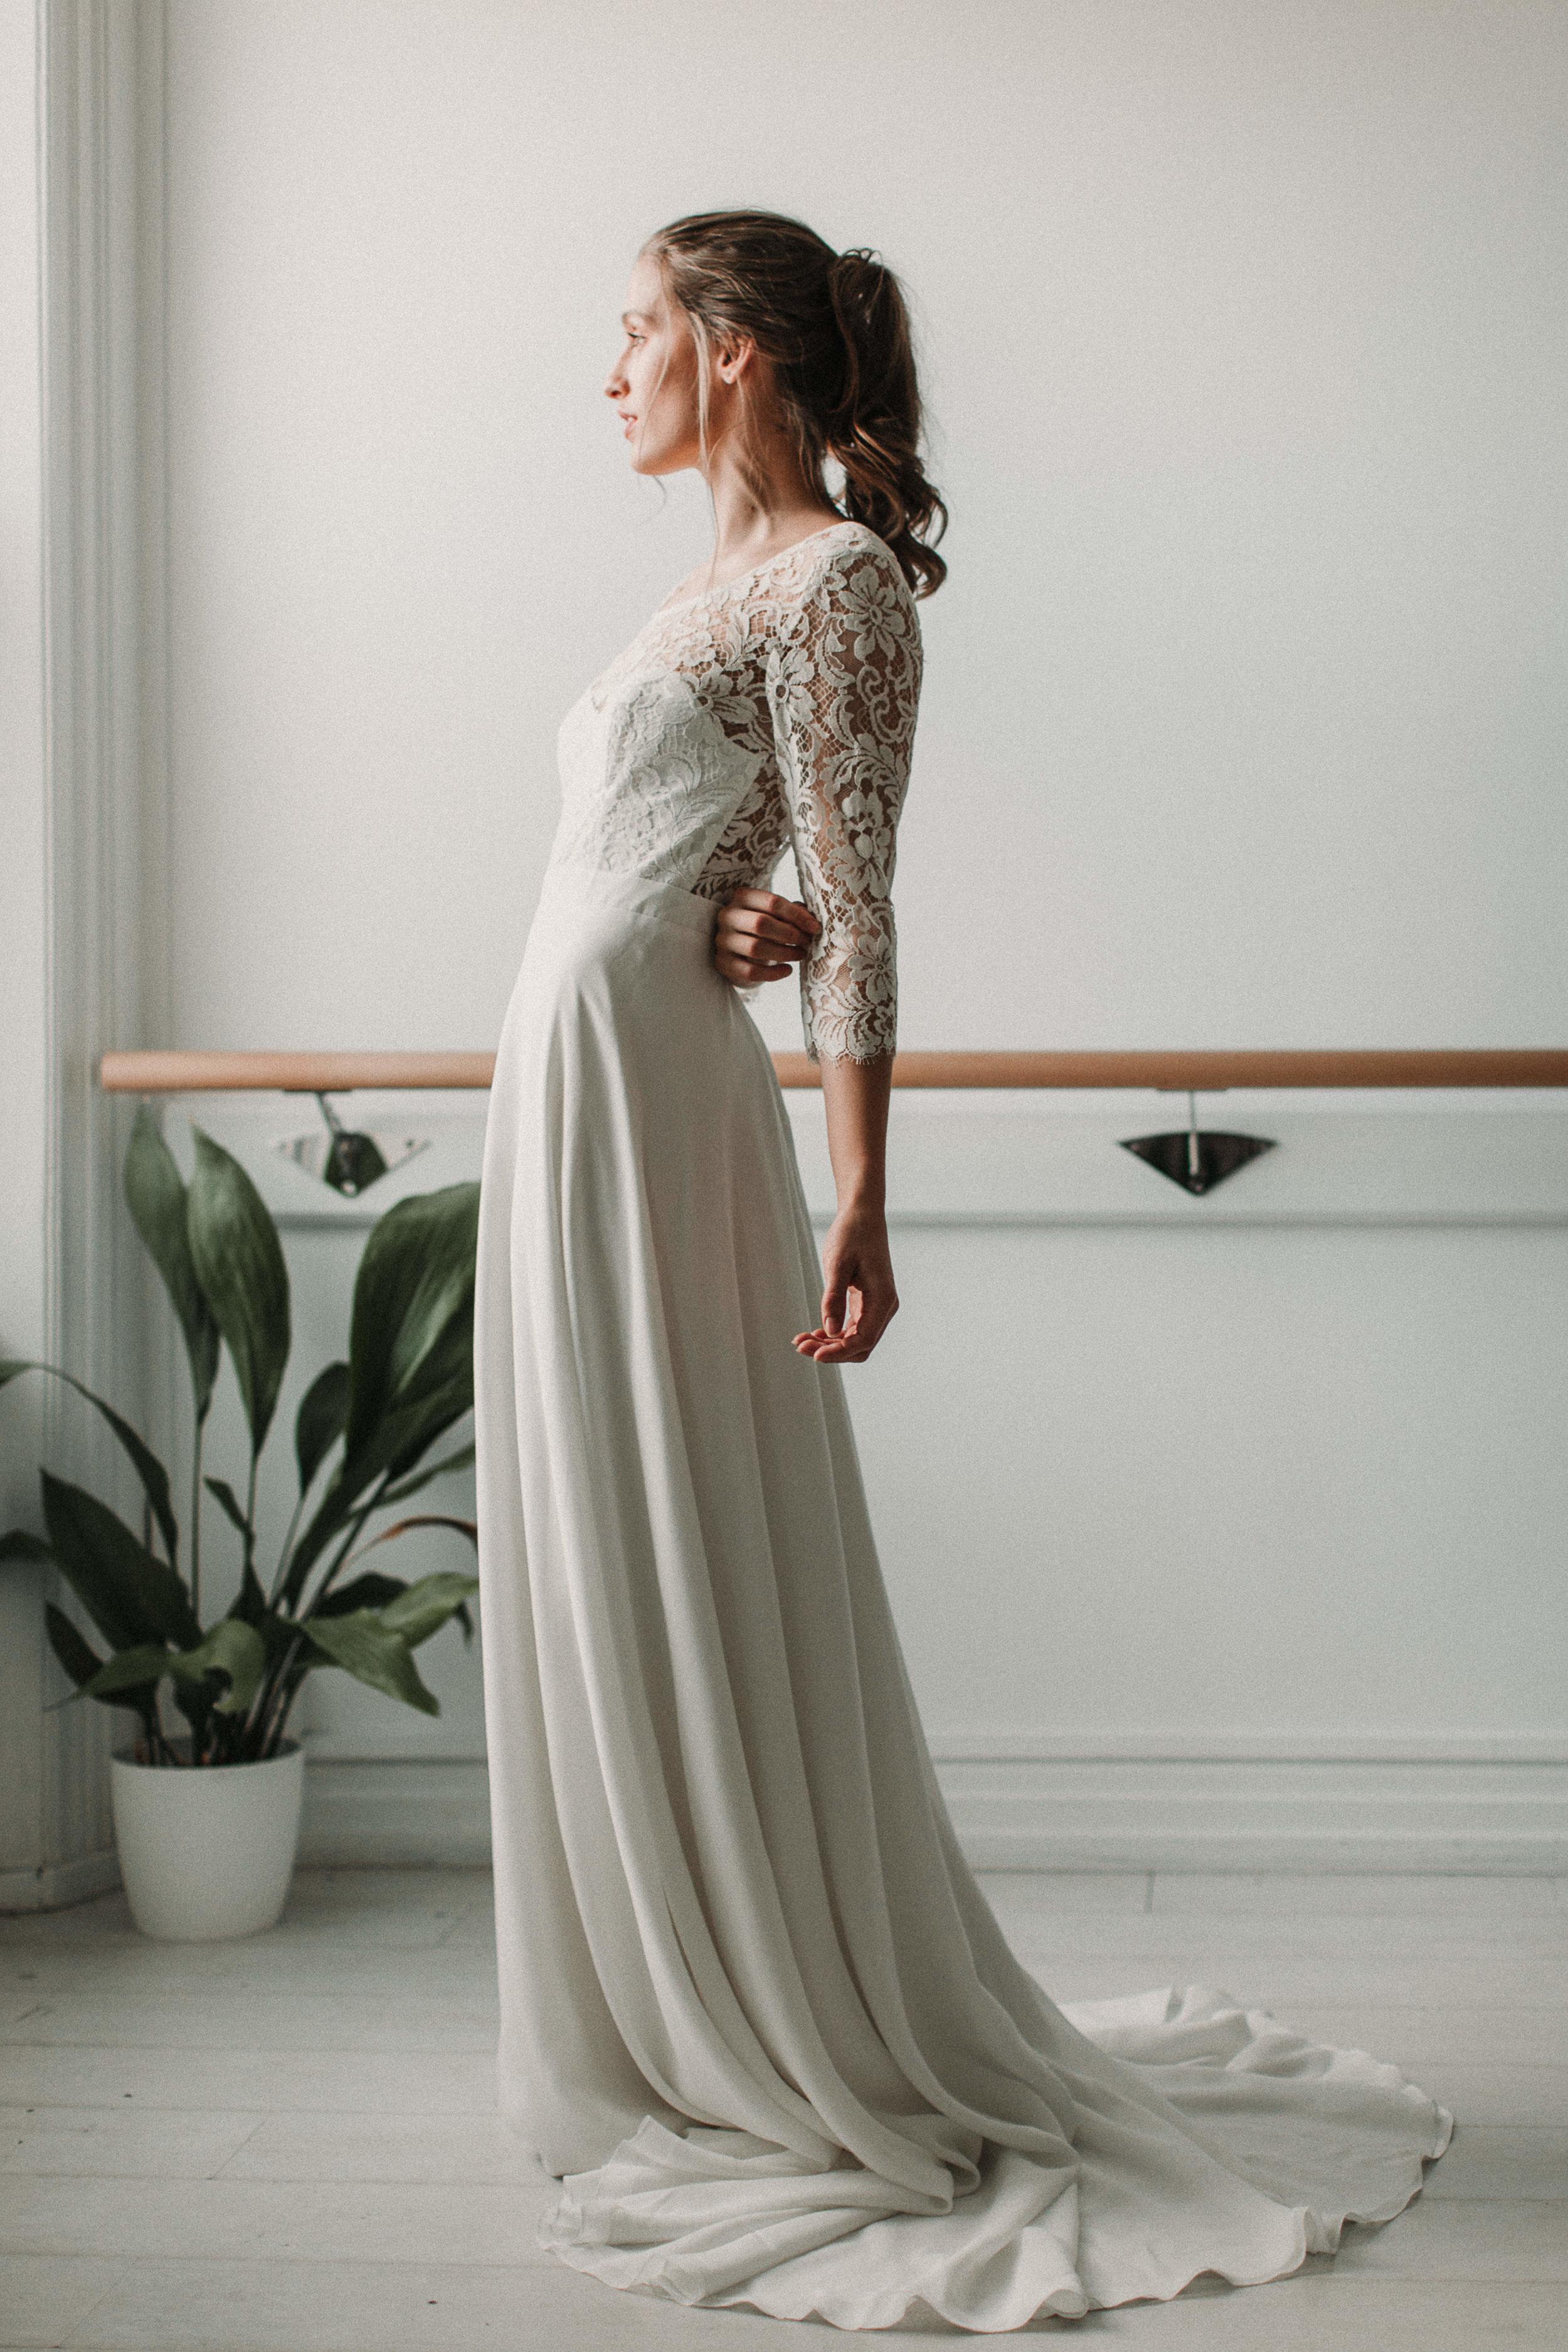 npluck_luna_bride-138.jpg